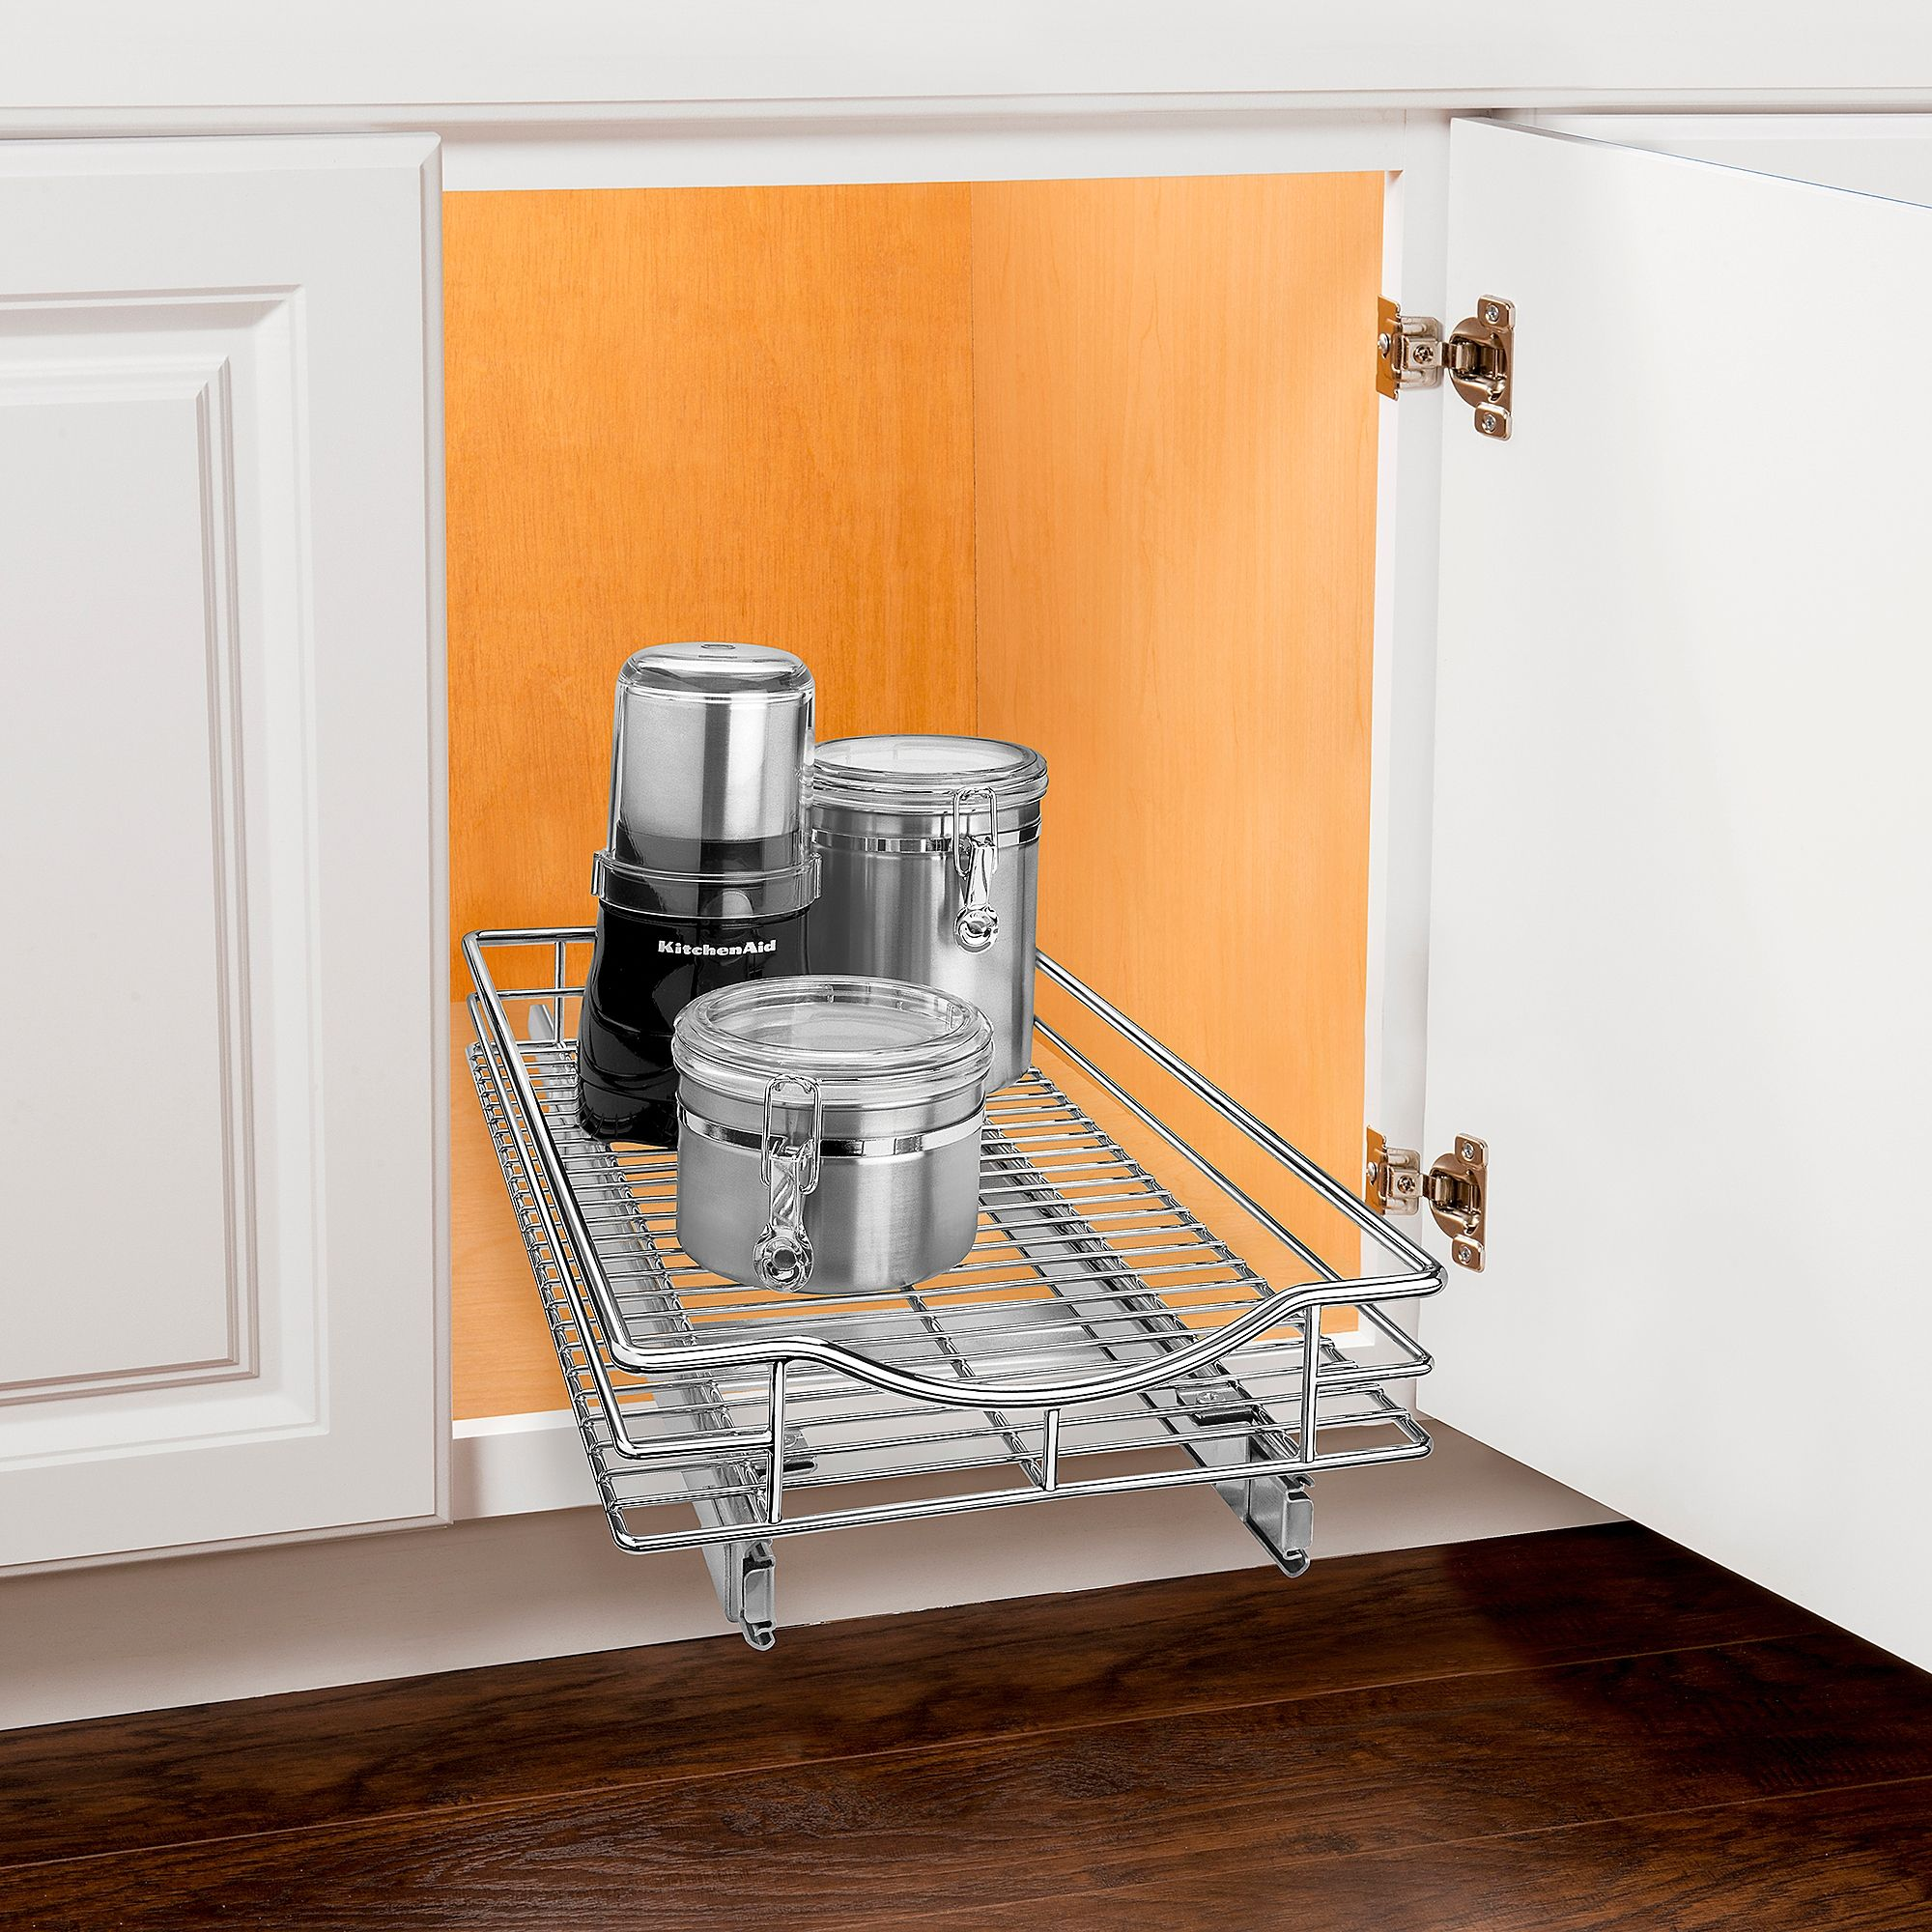 Lynk Professional Wide Roll Out 11 Inch Under Cabinet Sliding Shelf Sliding Shelves Cabinet Organization Cabinets Organization